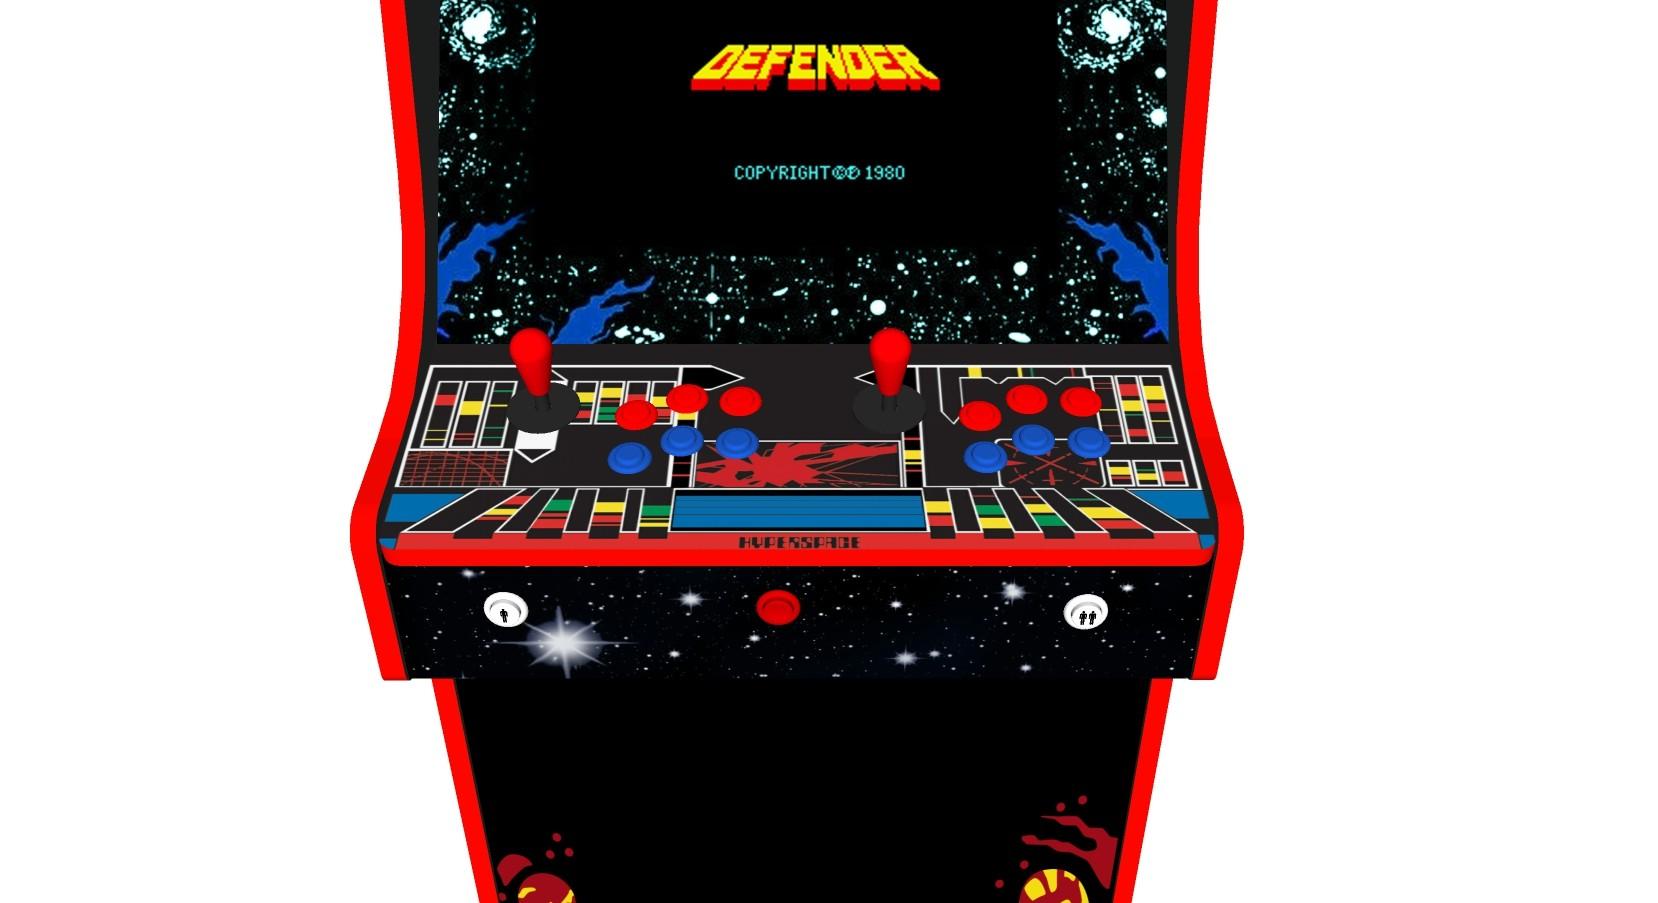 Defender Arcade Machine 2 Player Upright - Buttons